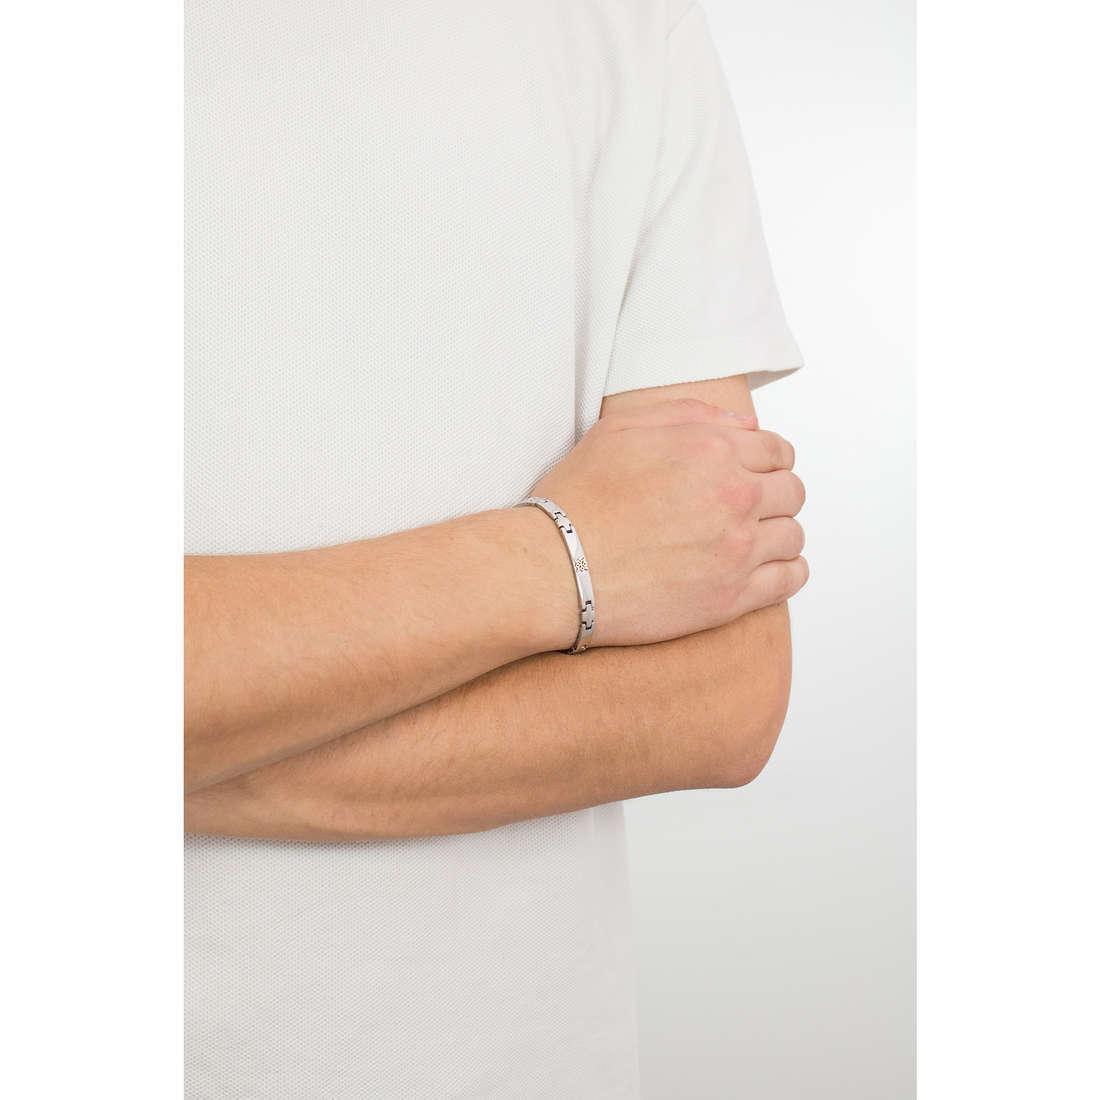 Luca Barra bracciali uomo LBBA719 indosso